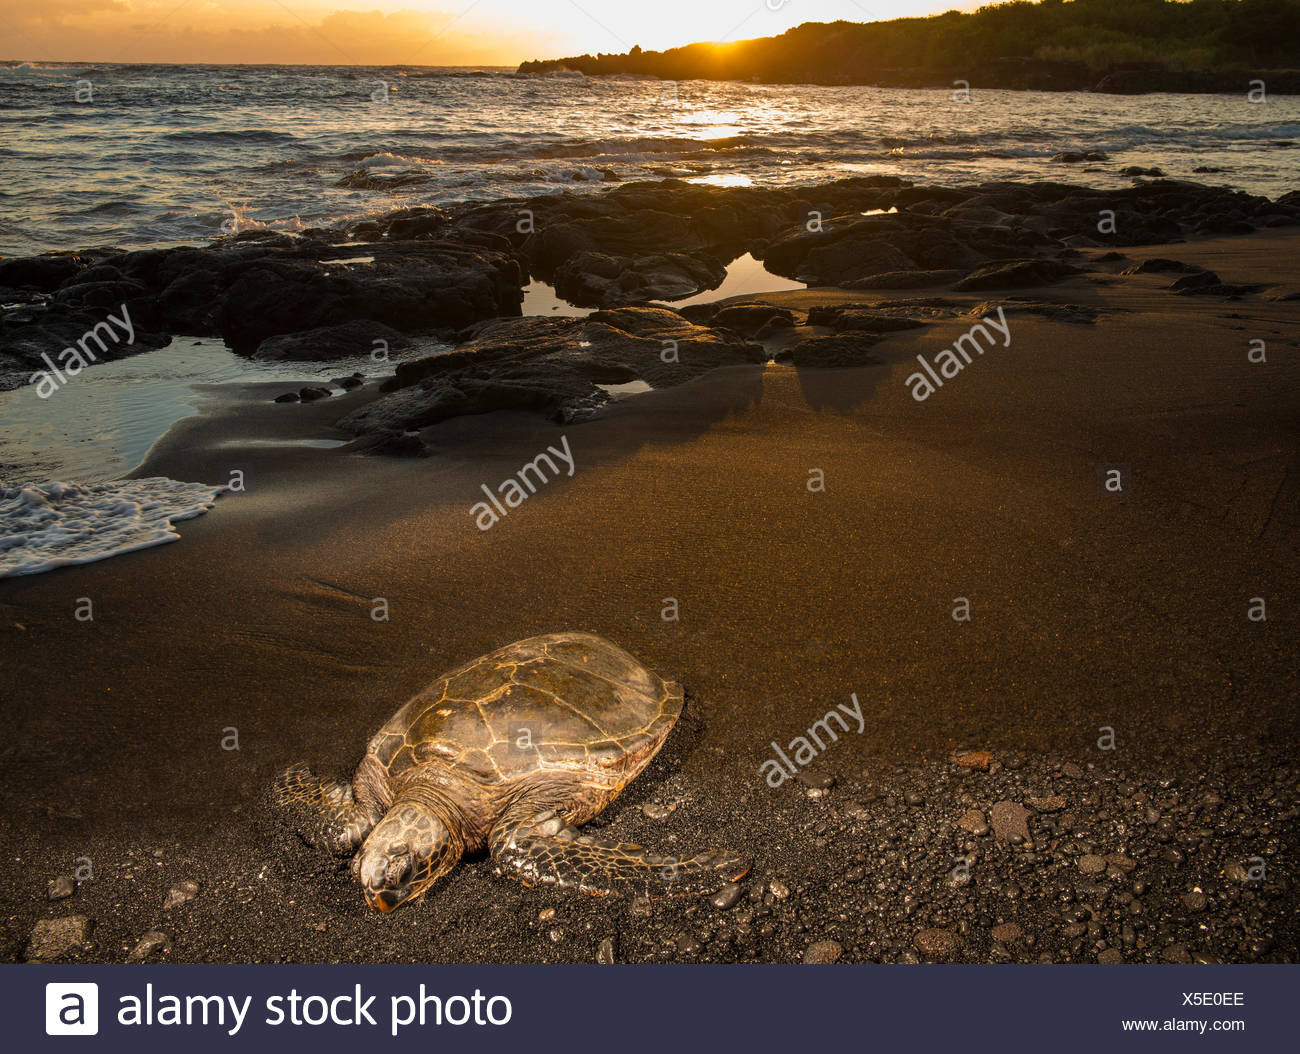 Isla Grande,tortuga,Punaluu,playa de arena negra, Big Island,ESTADOS UNIDOS,Hawaii,Latina,animales,animal,Volcanical,lava Foto de stock